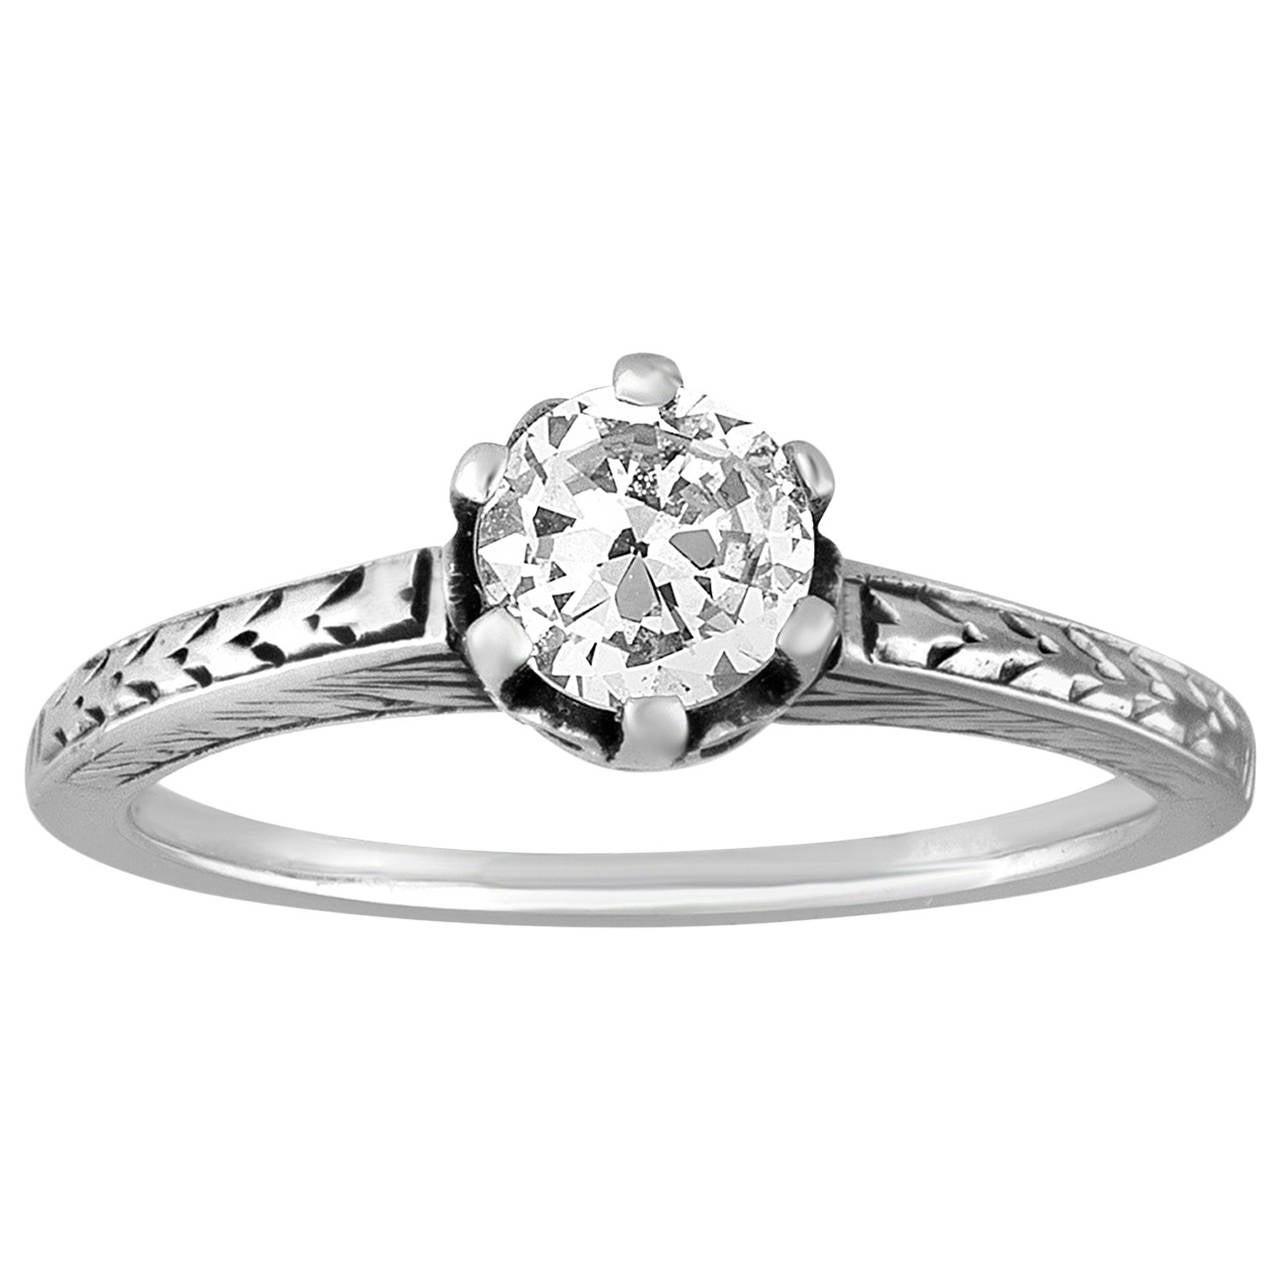 0.50 Carat Diamond Solitaire Gold Ring